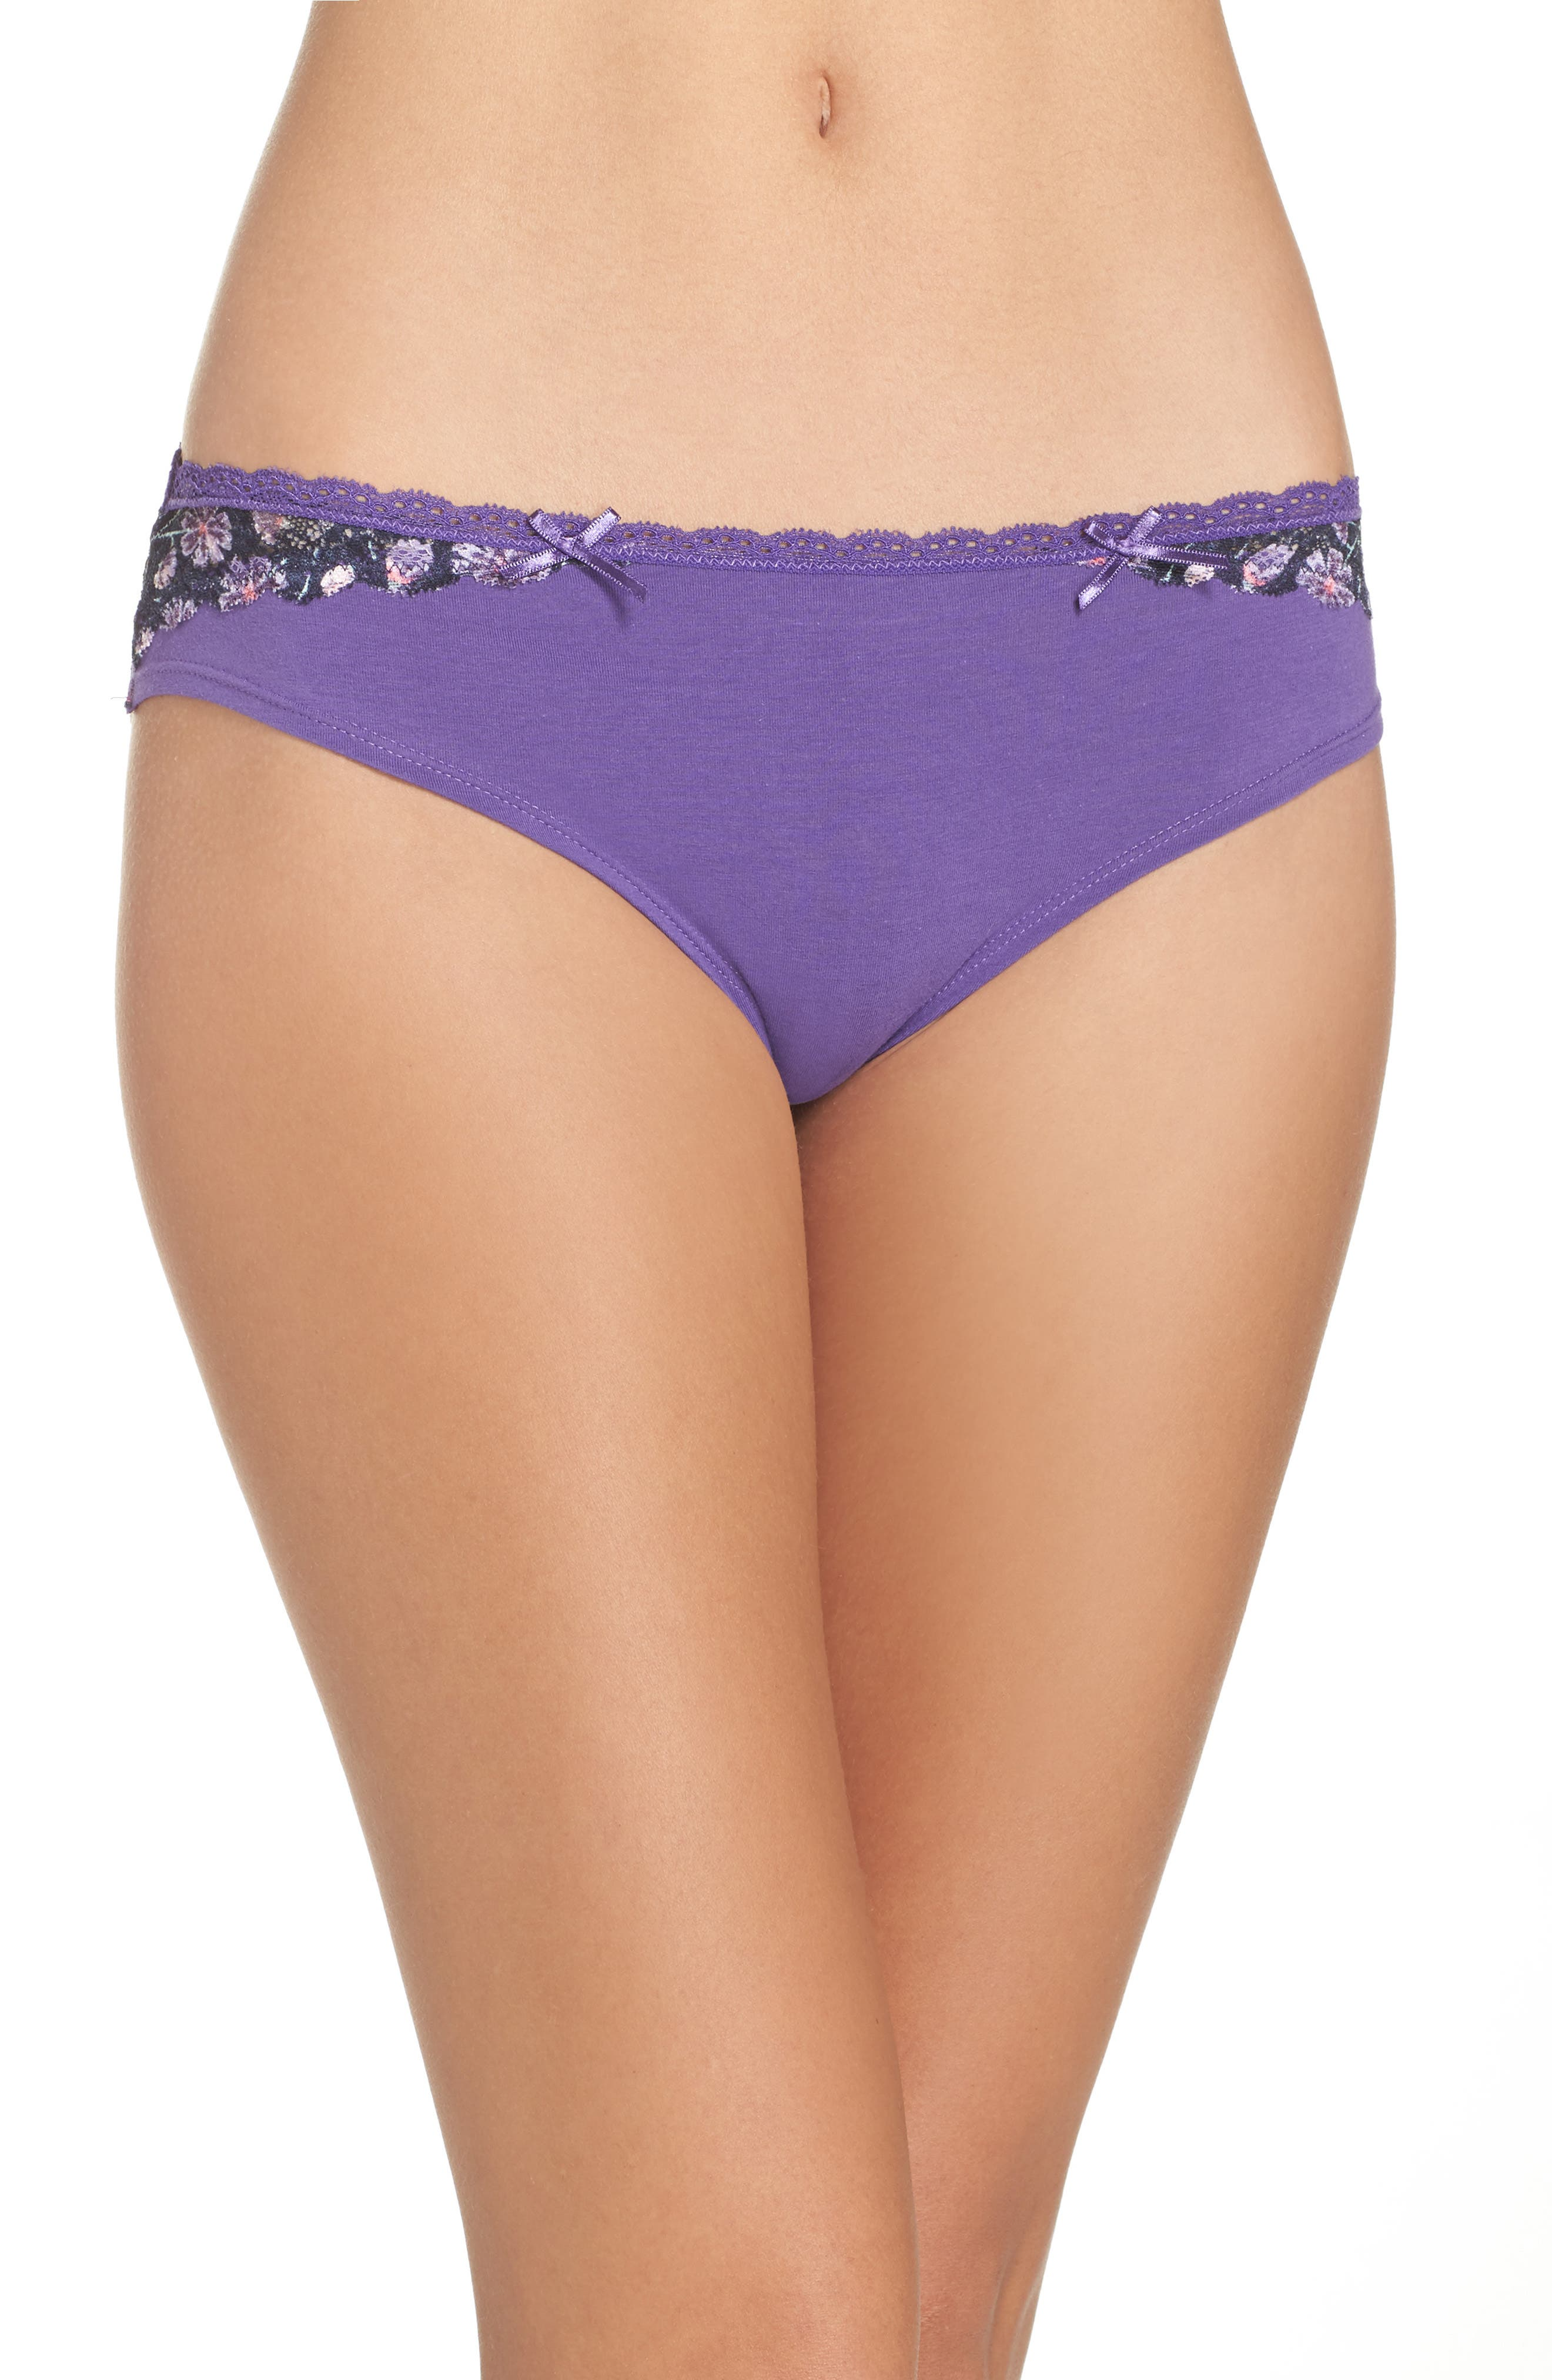 h.dew Becca Bikini (5 for $30)